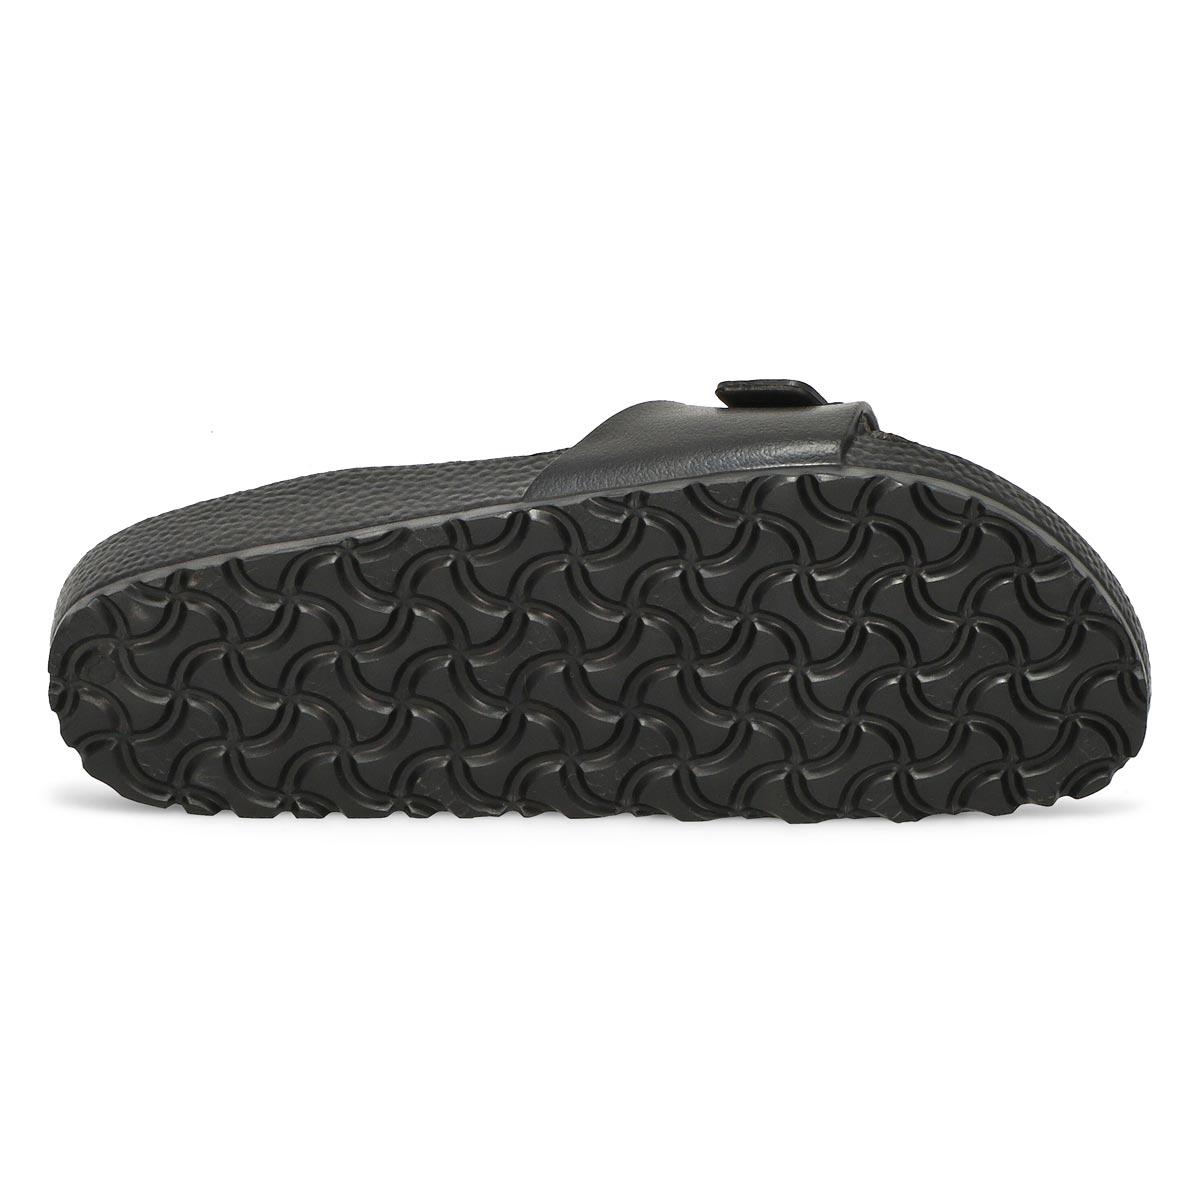 Sandale MADRID, noir, fem - Étroit